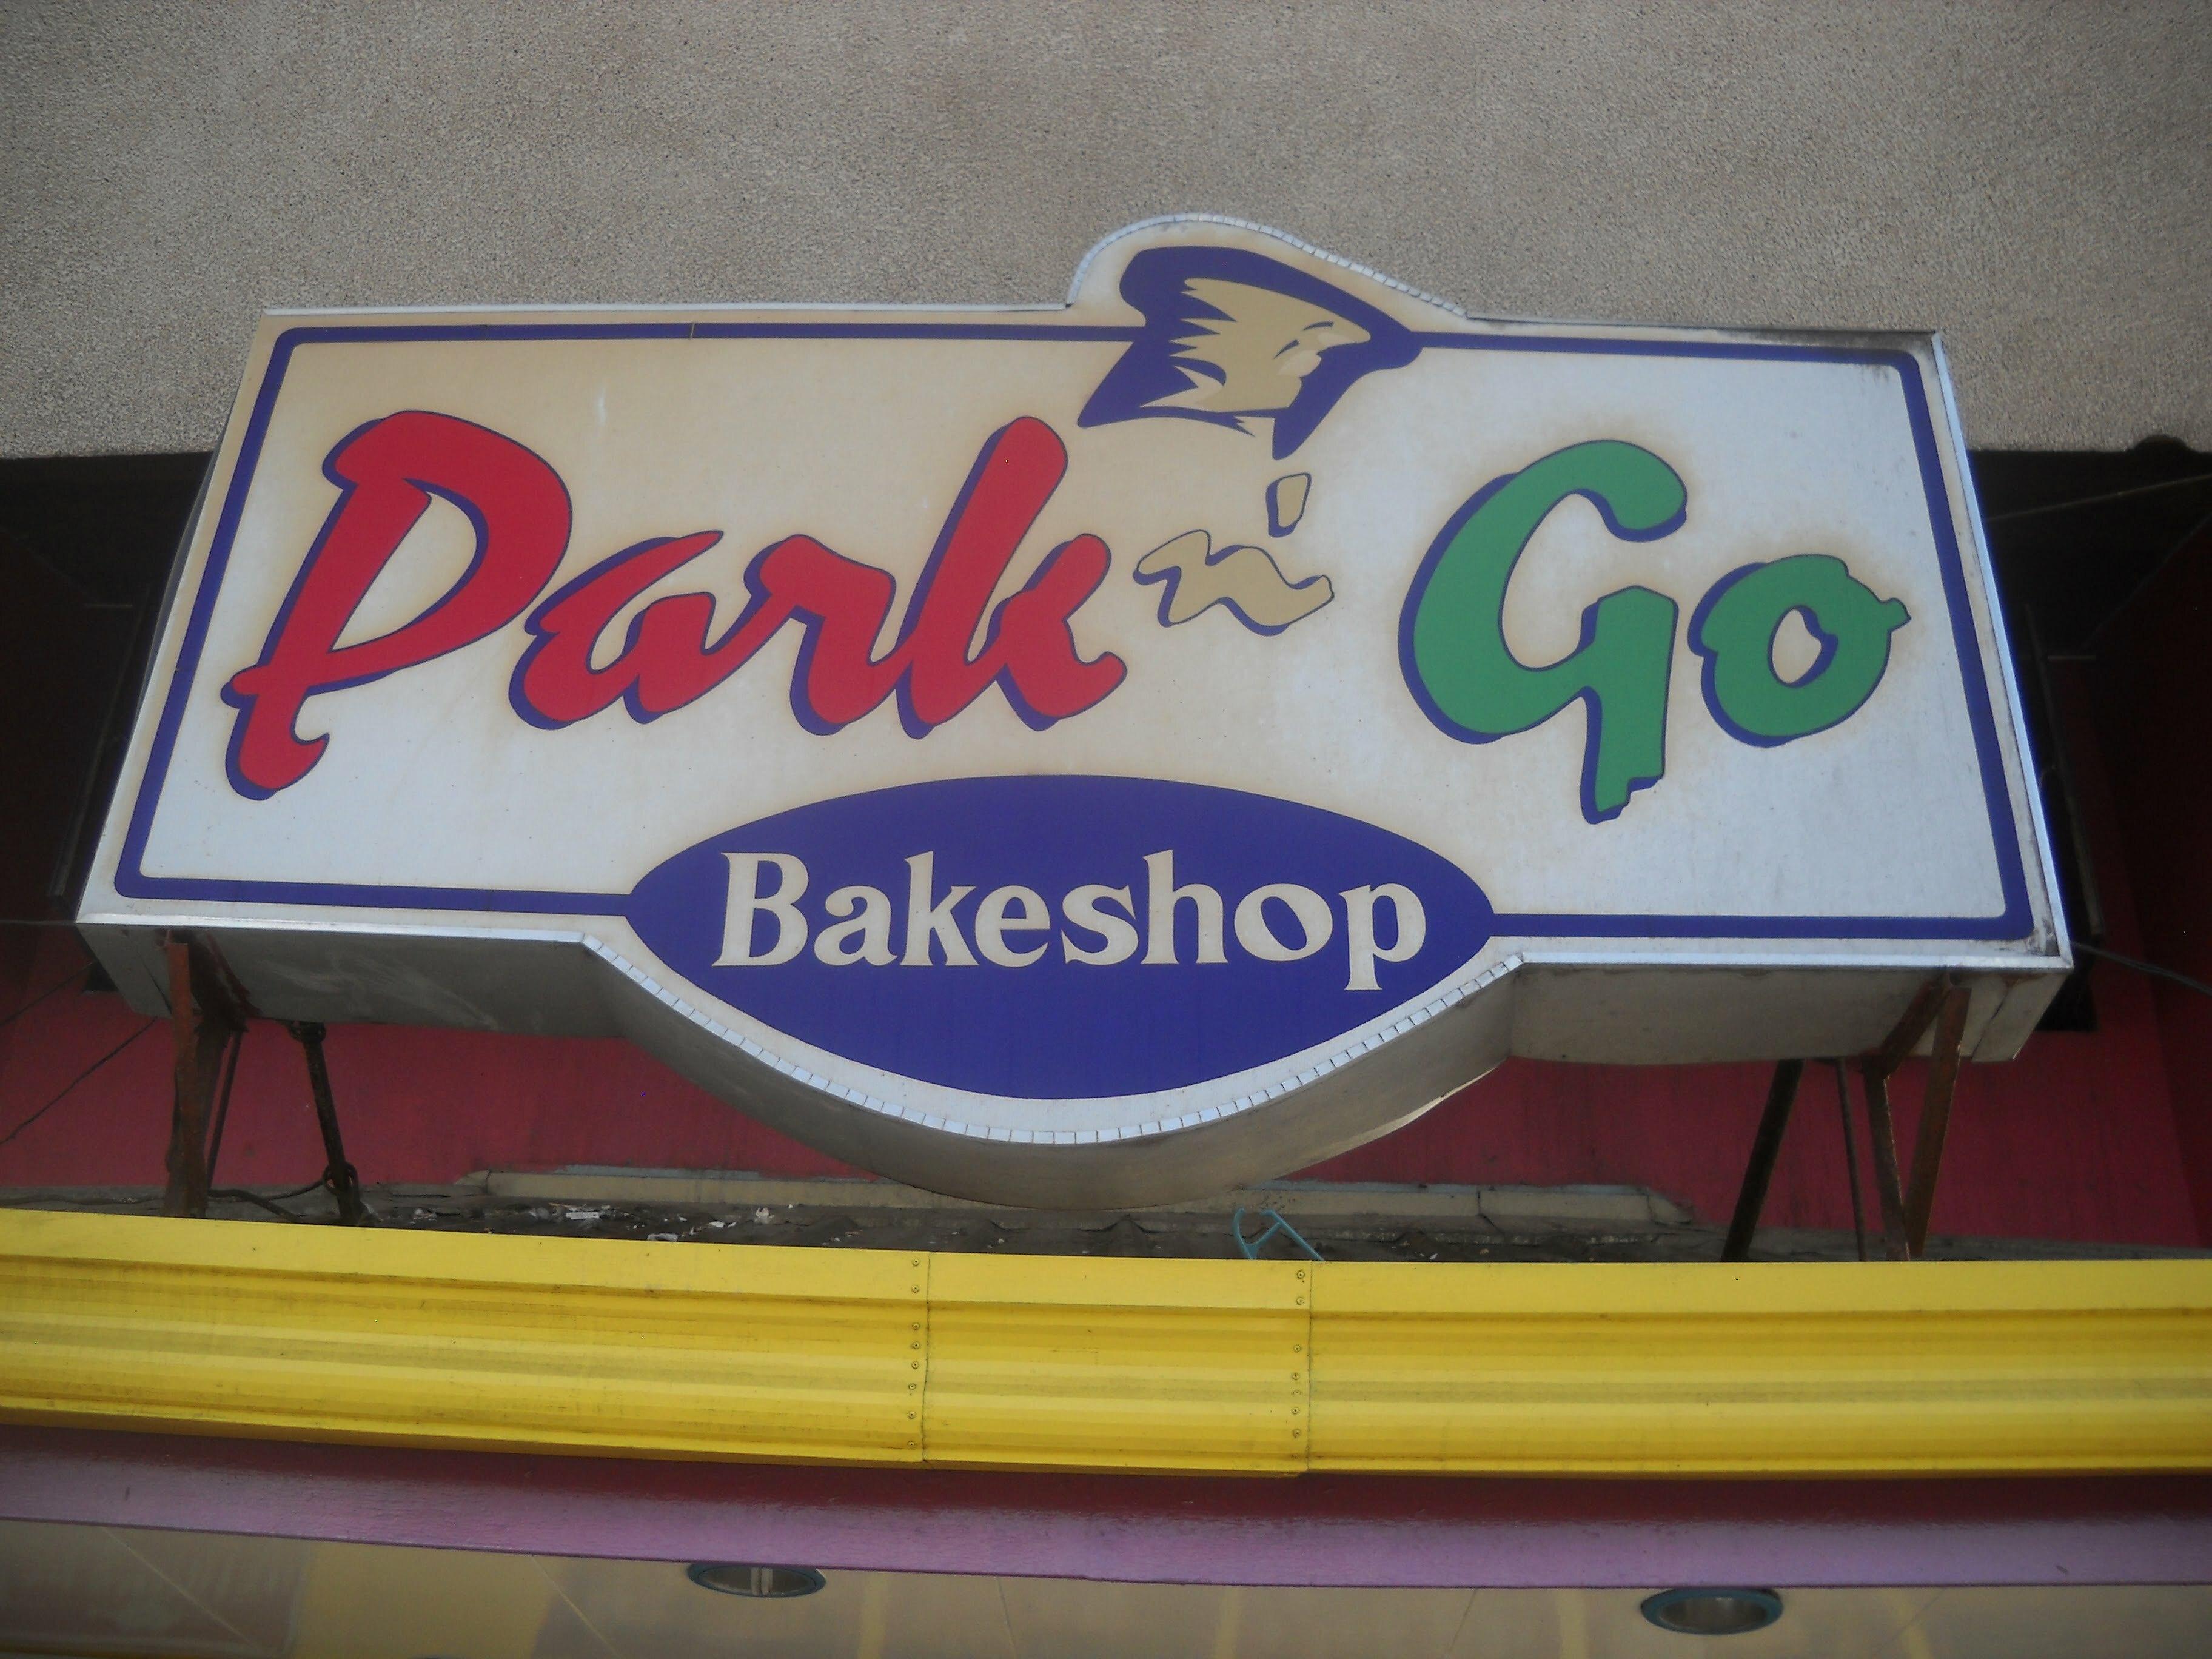 Park n' Go Bakeshop